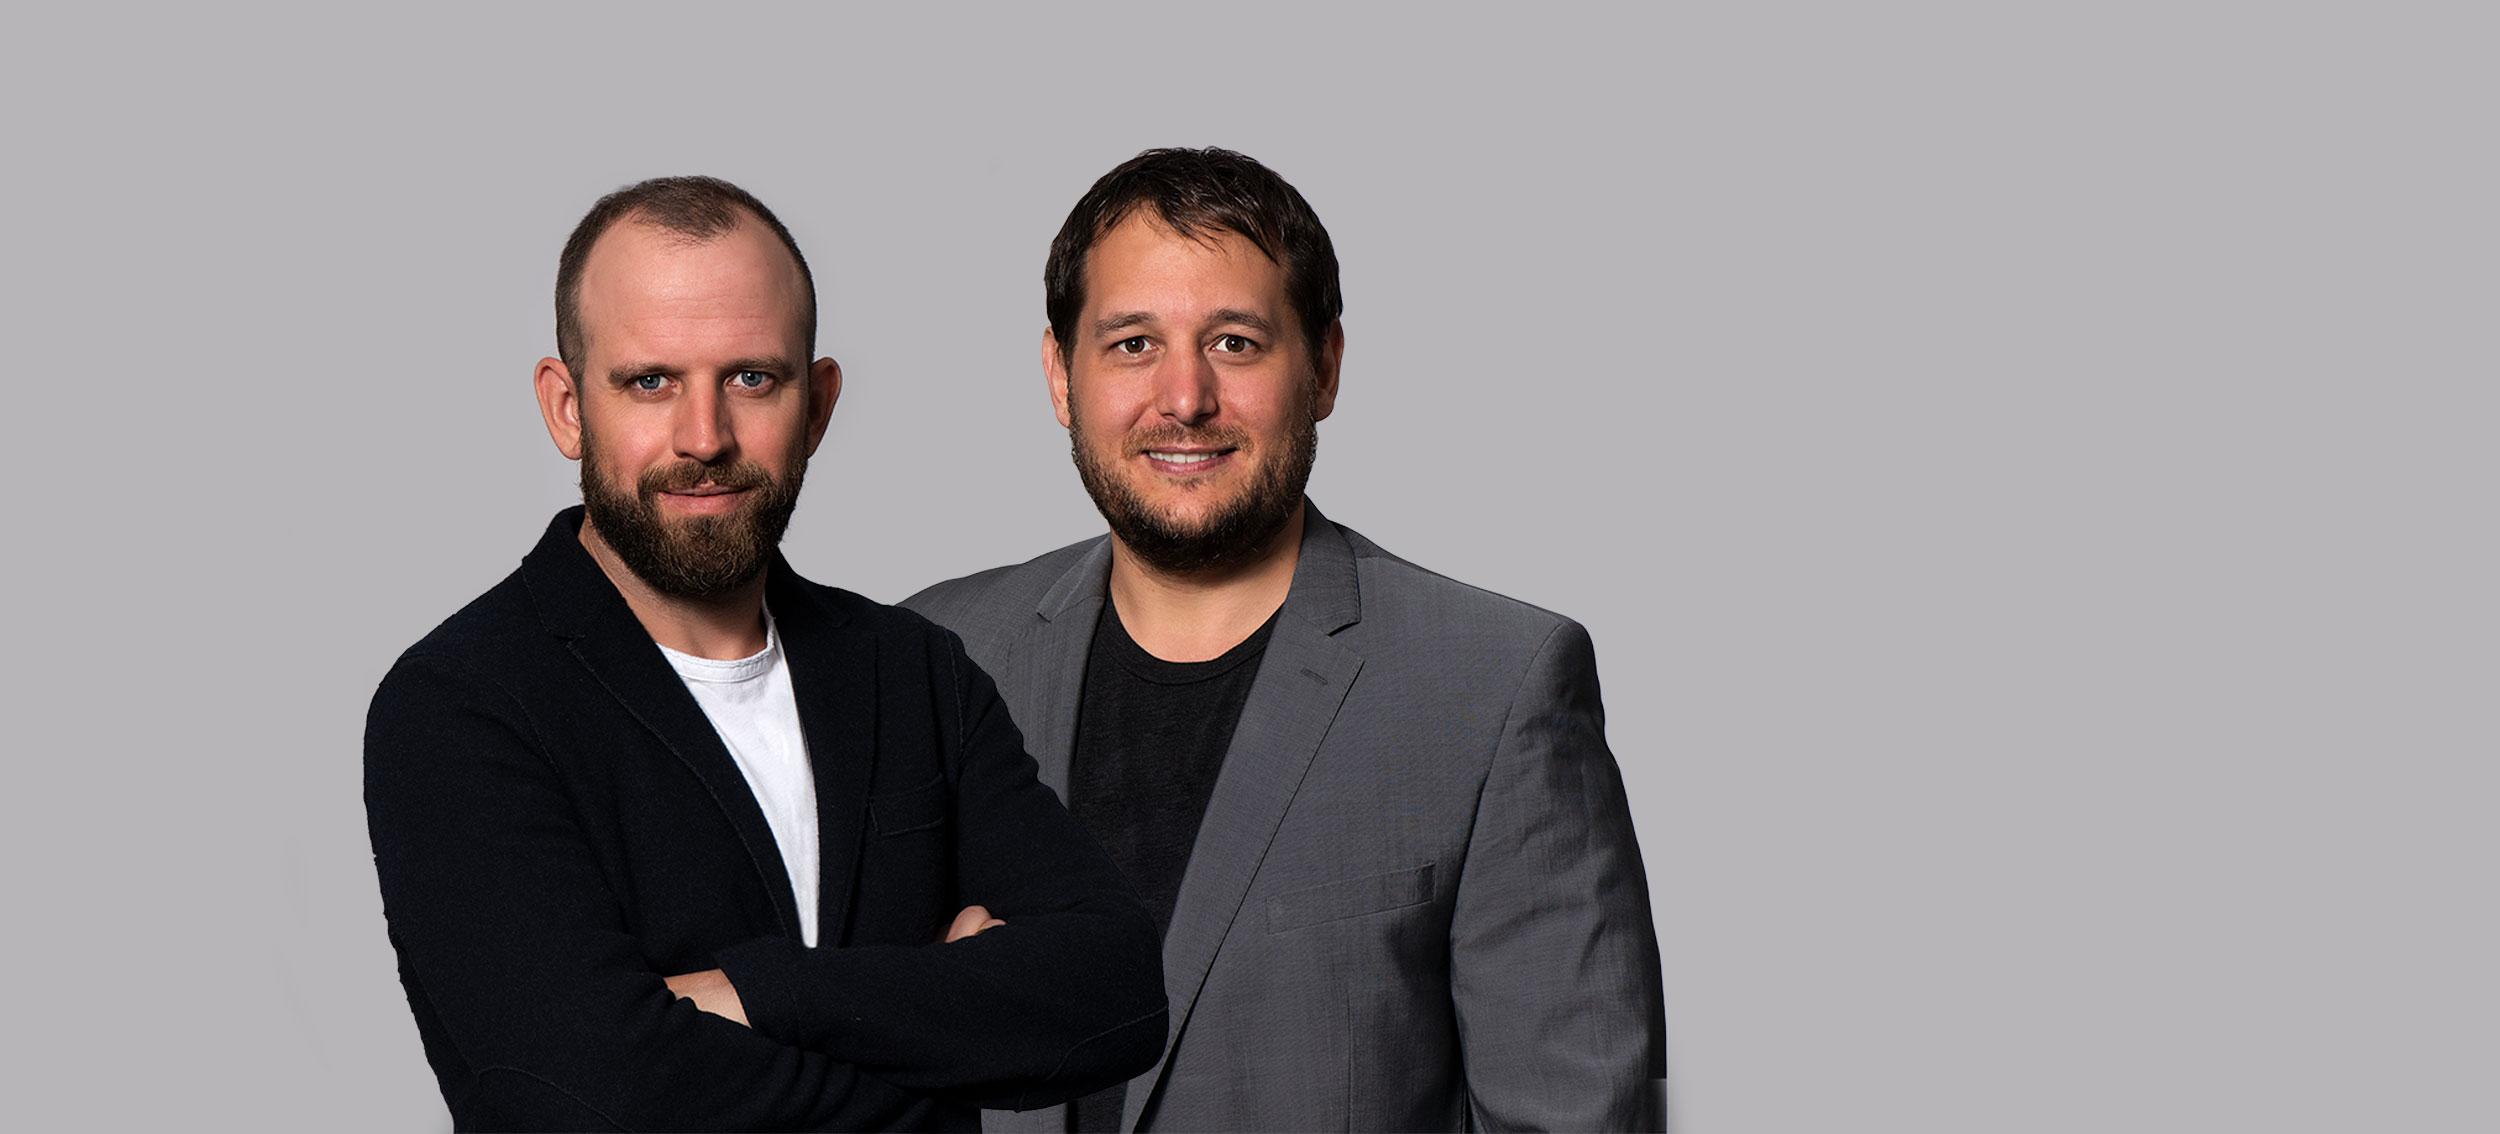 HEOX - Unternehmensberatung - Mag. Christoph Hasibeder & Mag. Rudolf Obholzer